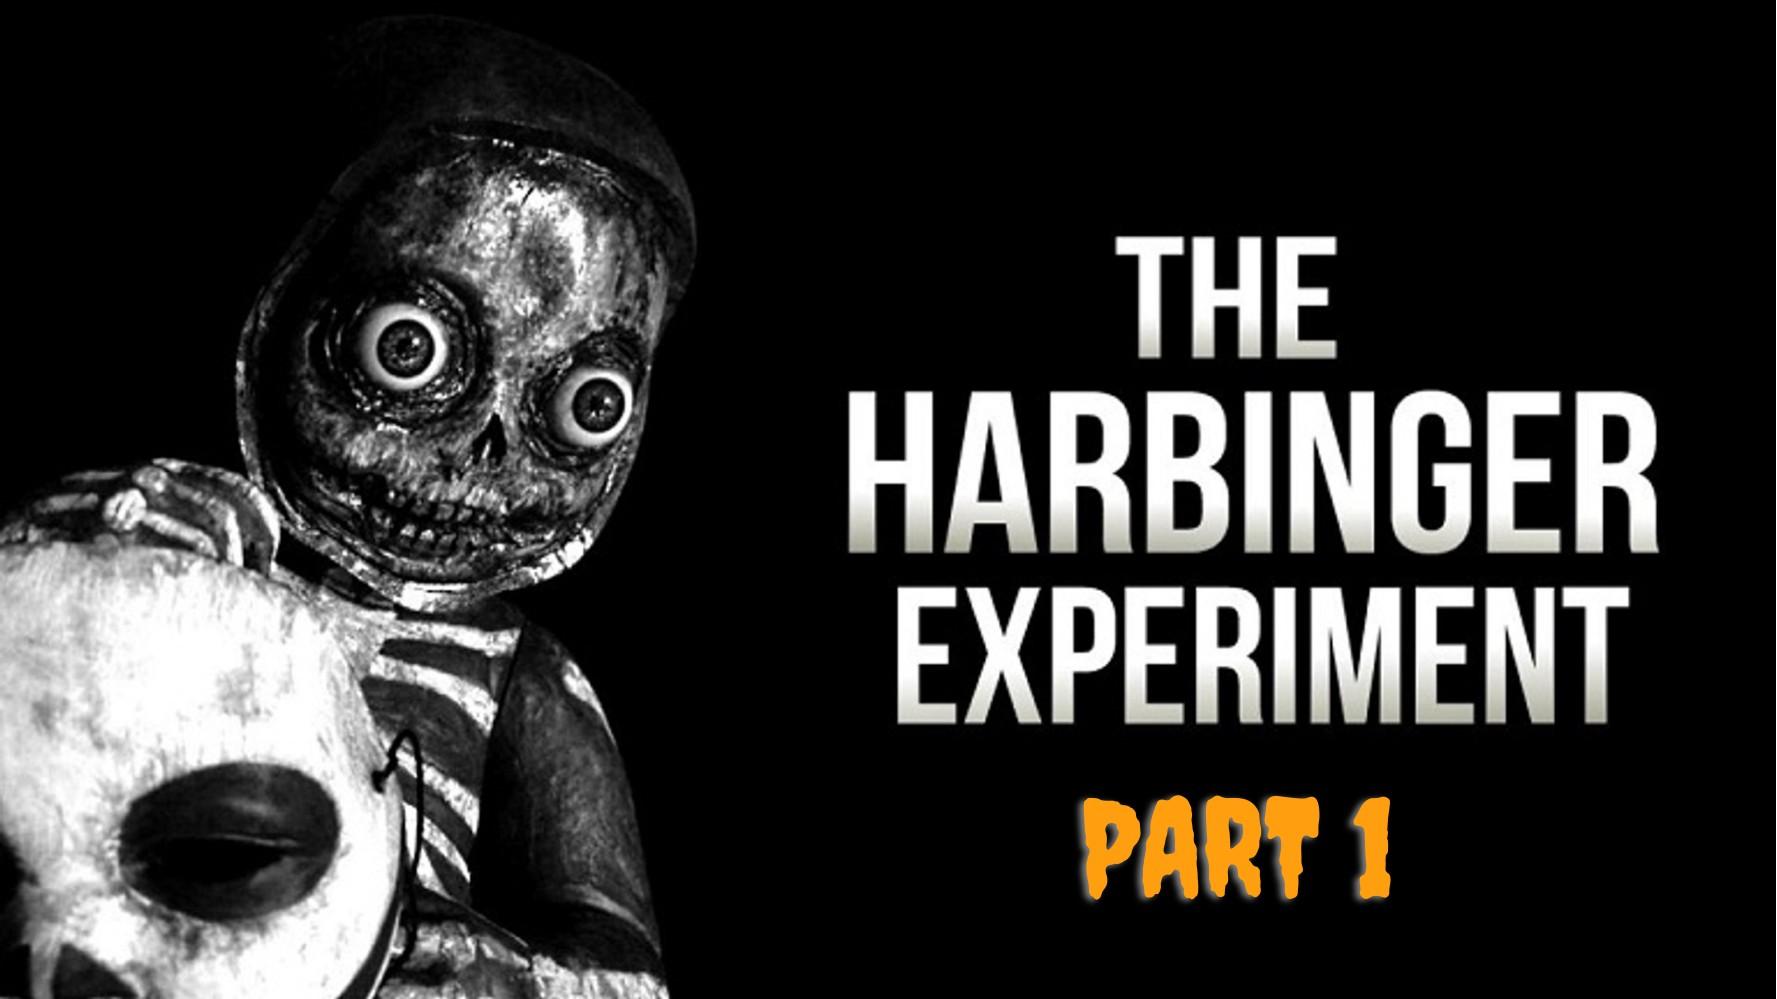 The Harbinger Experiment Part 1